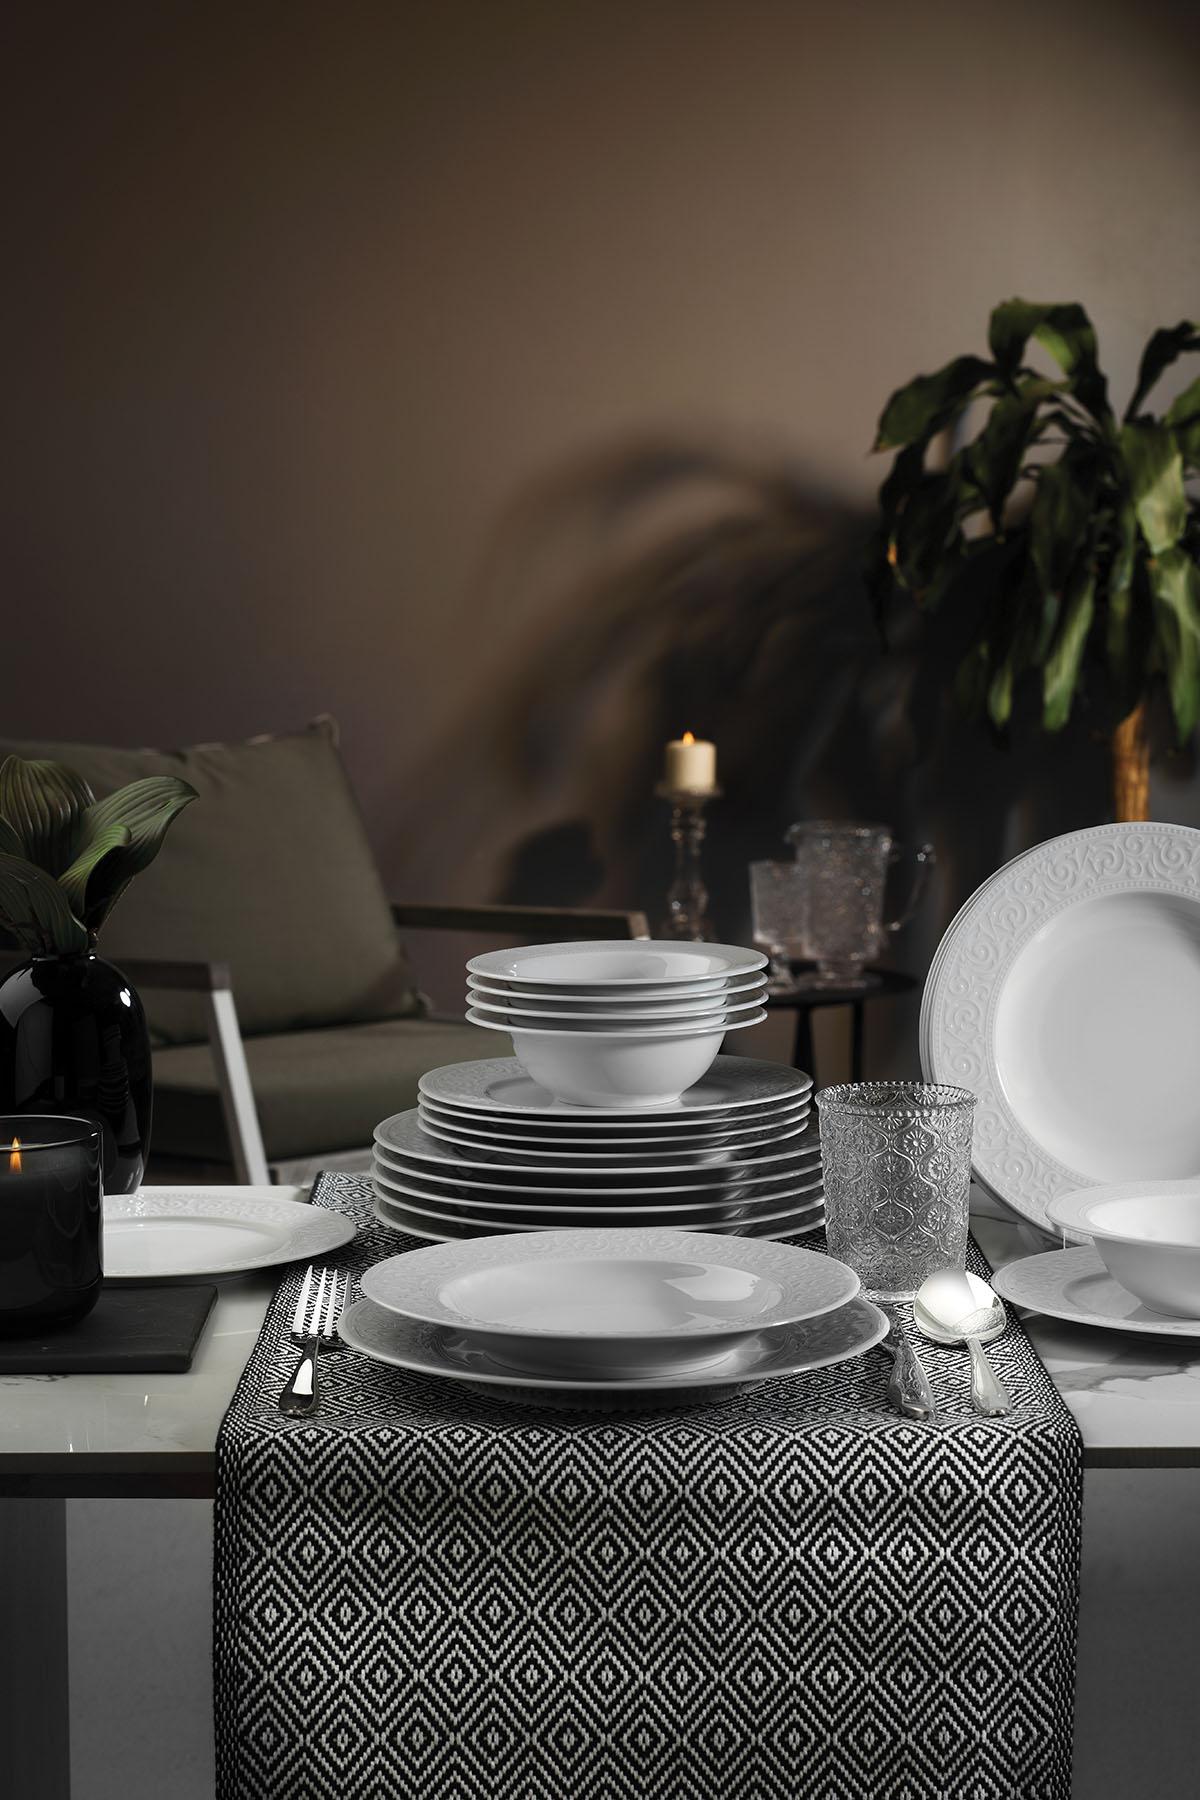 Kütahya Porselen - Kütahya Porselen Açelya 24 Parça Yemek Seti (1)